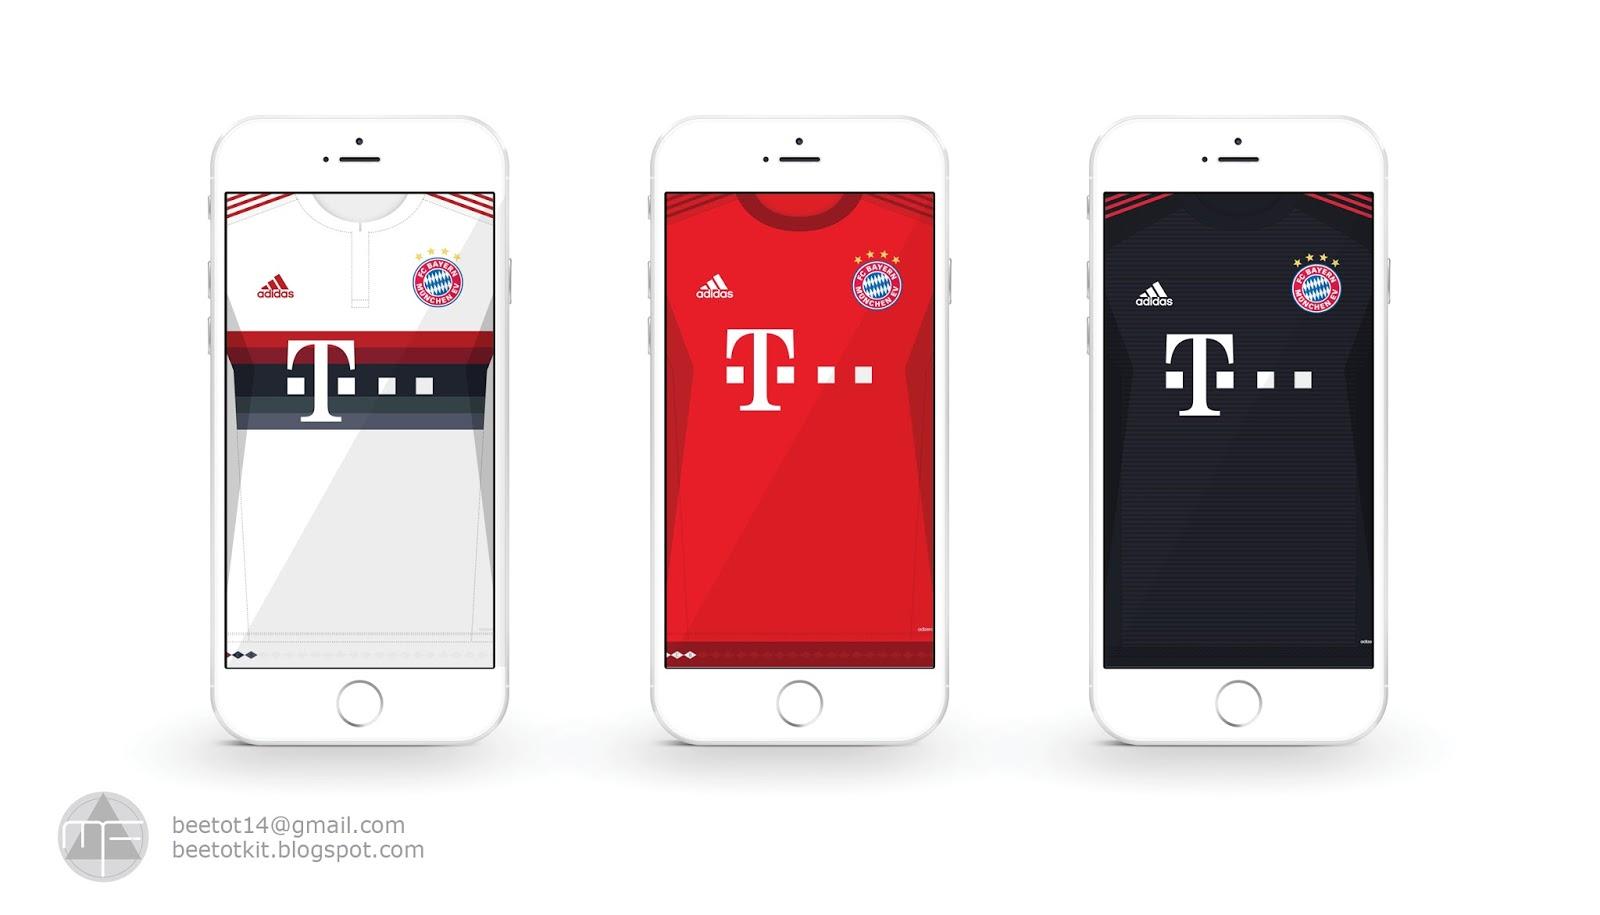 16 Luxury Pubg Wallpaper Iphone 6: Beetot Kit: Bayern Munchen Kit 15/16 Iphone 6 Wallpaper